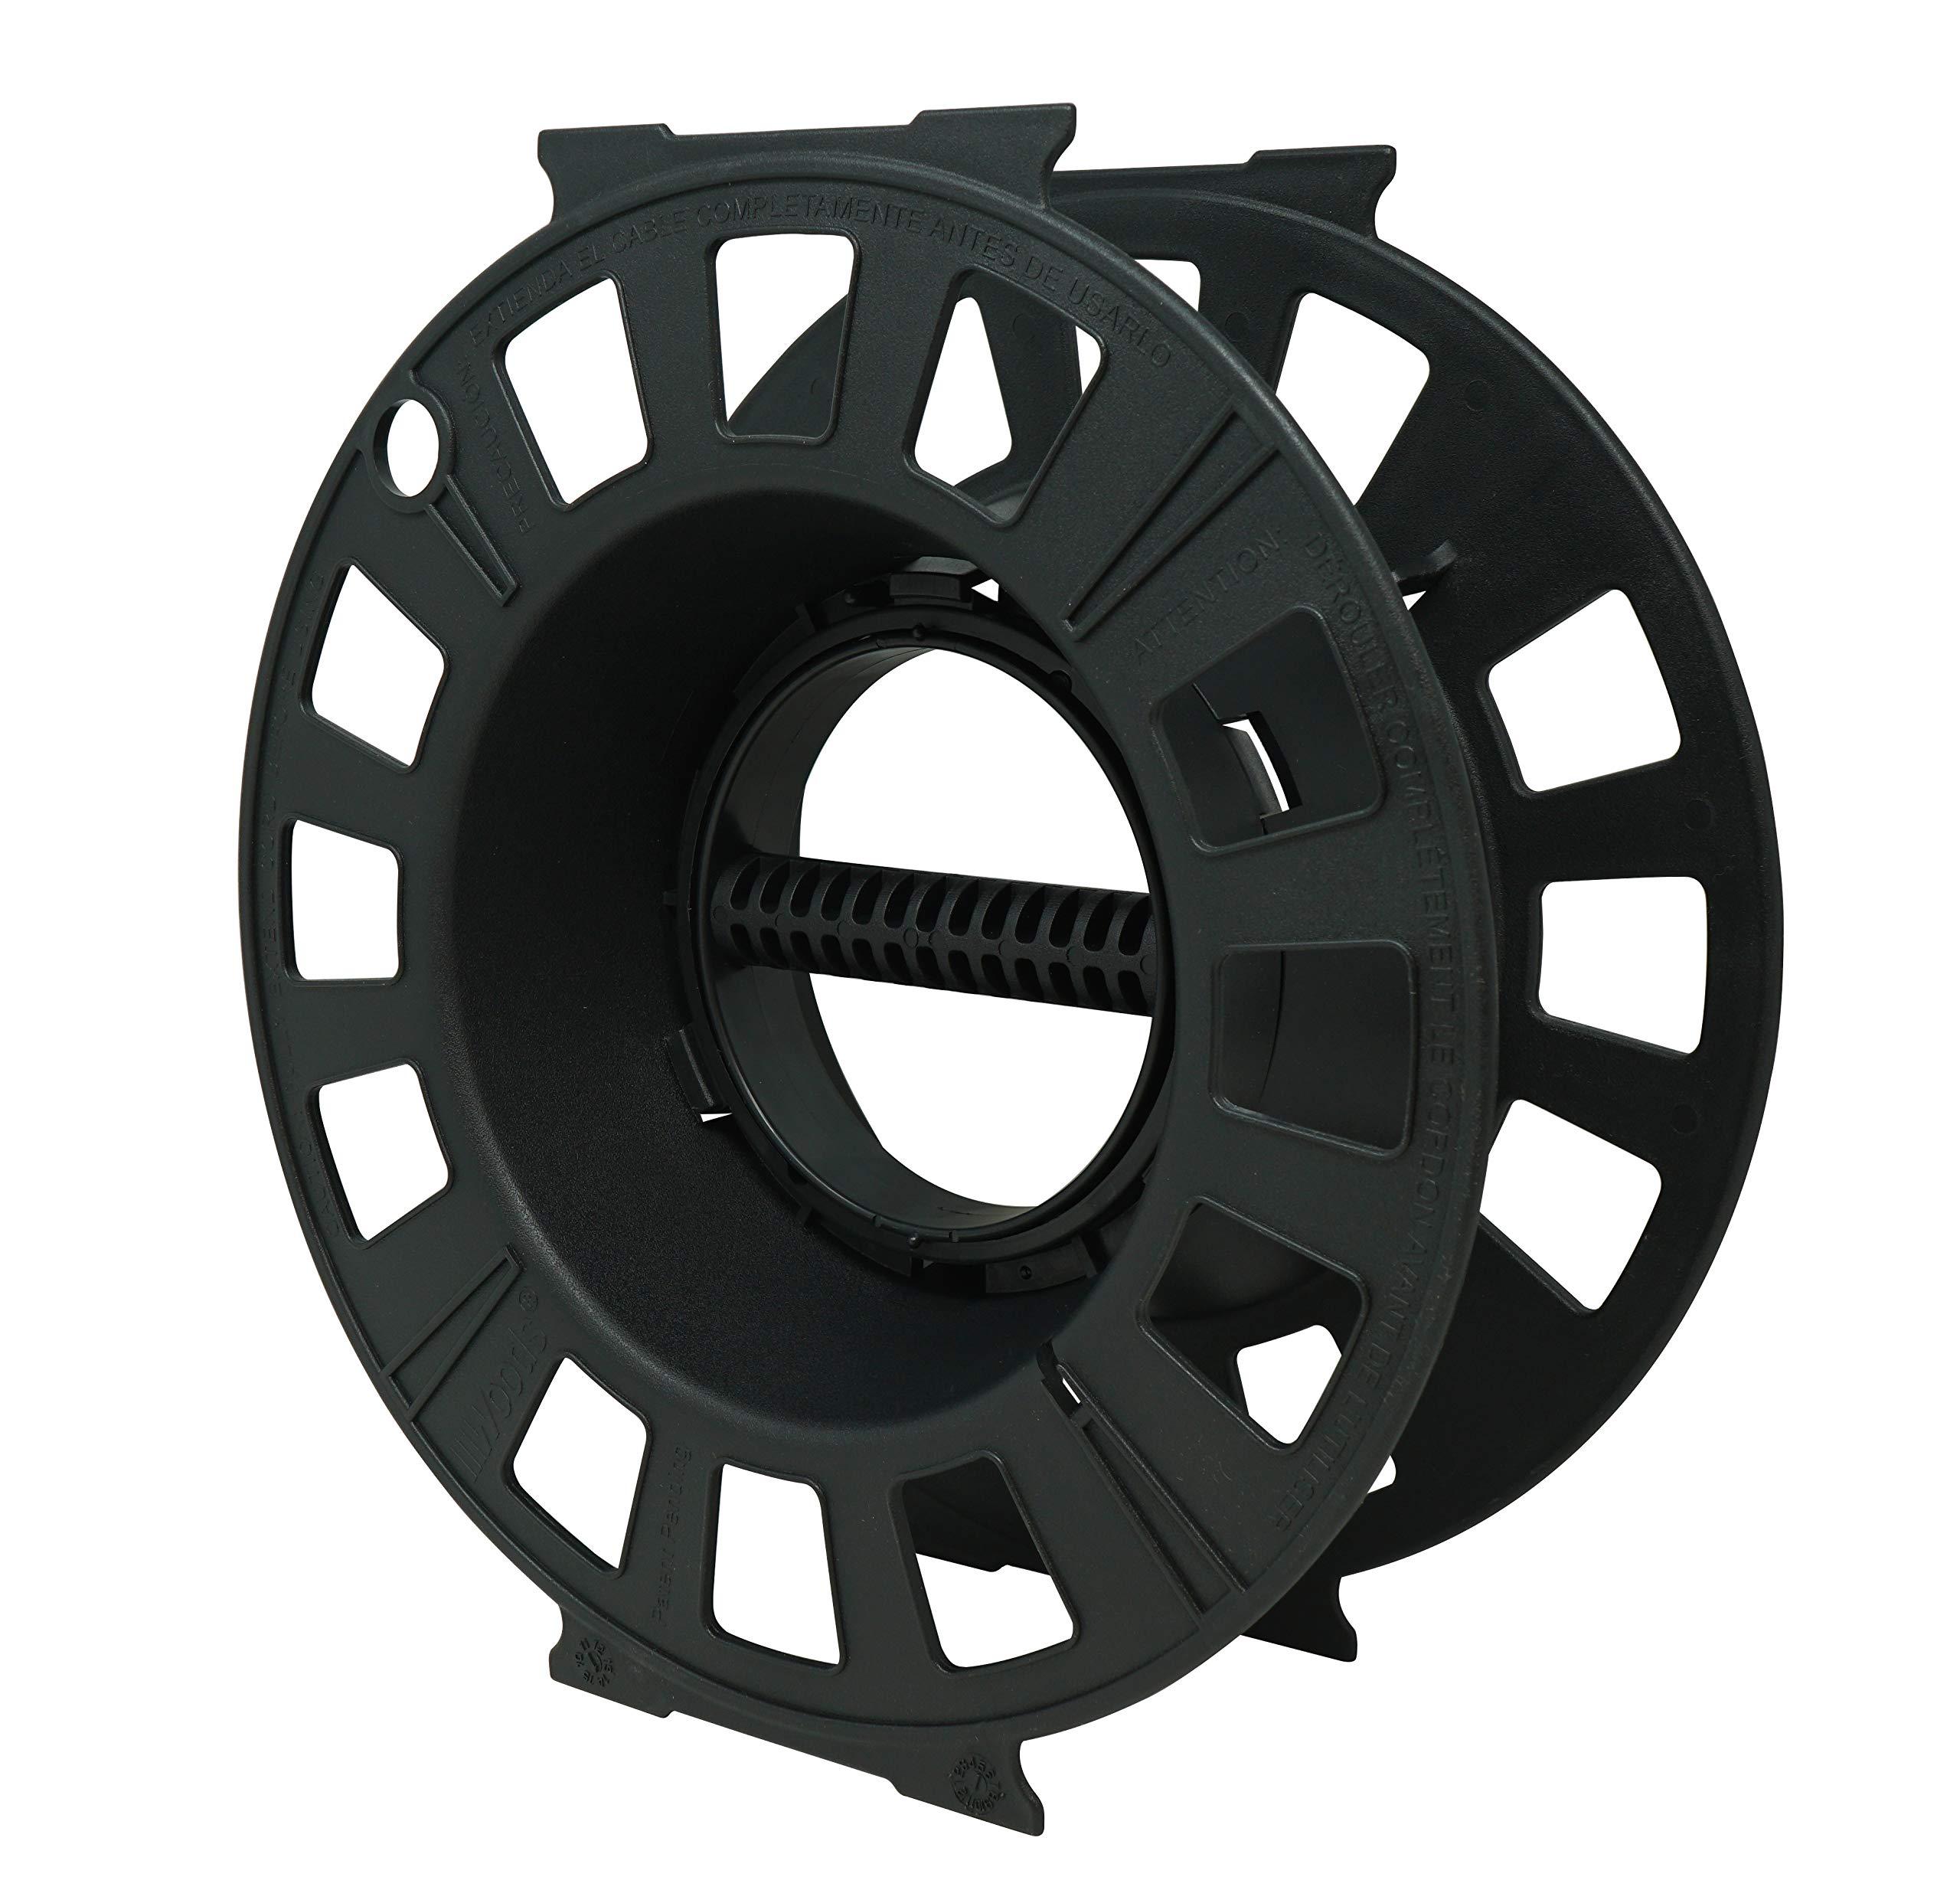 The Designers Edge 547702 Cord Reel, Black